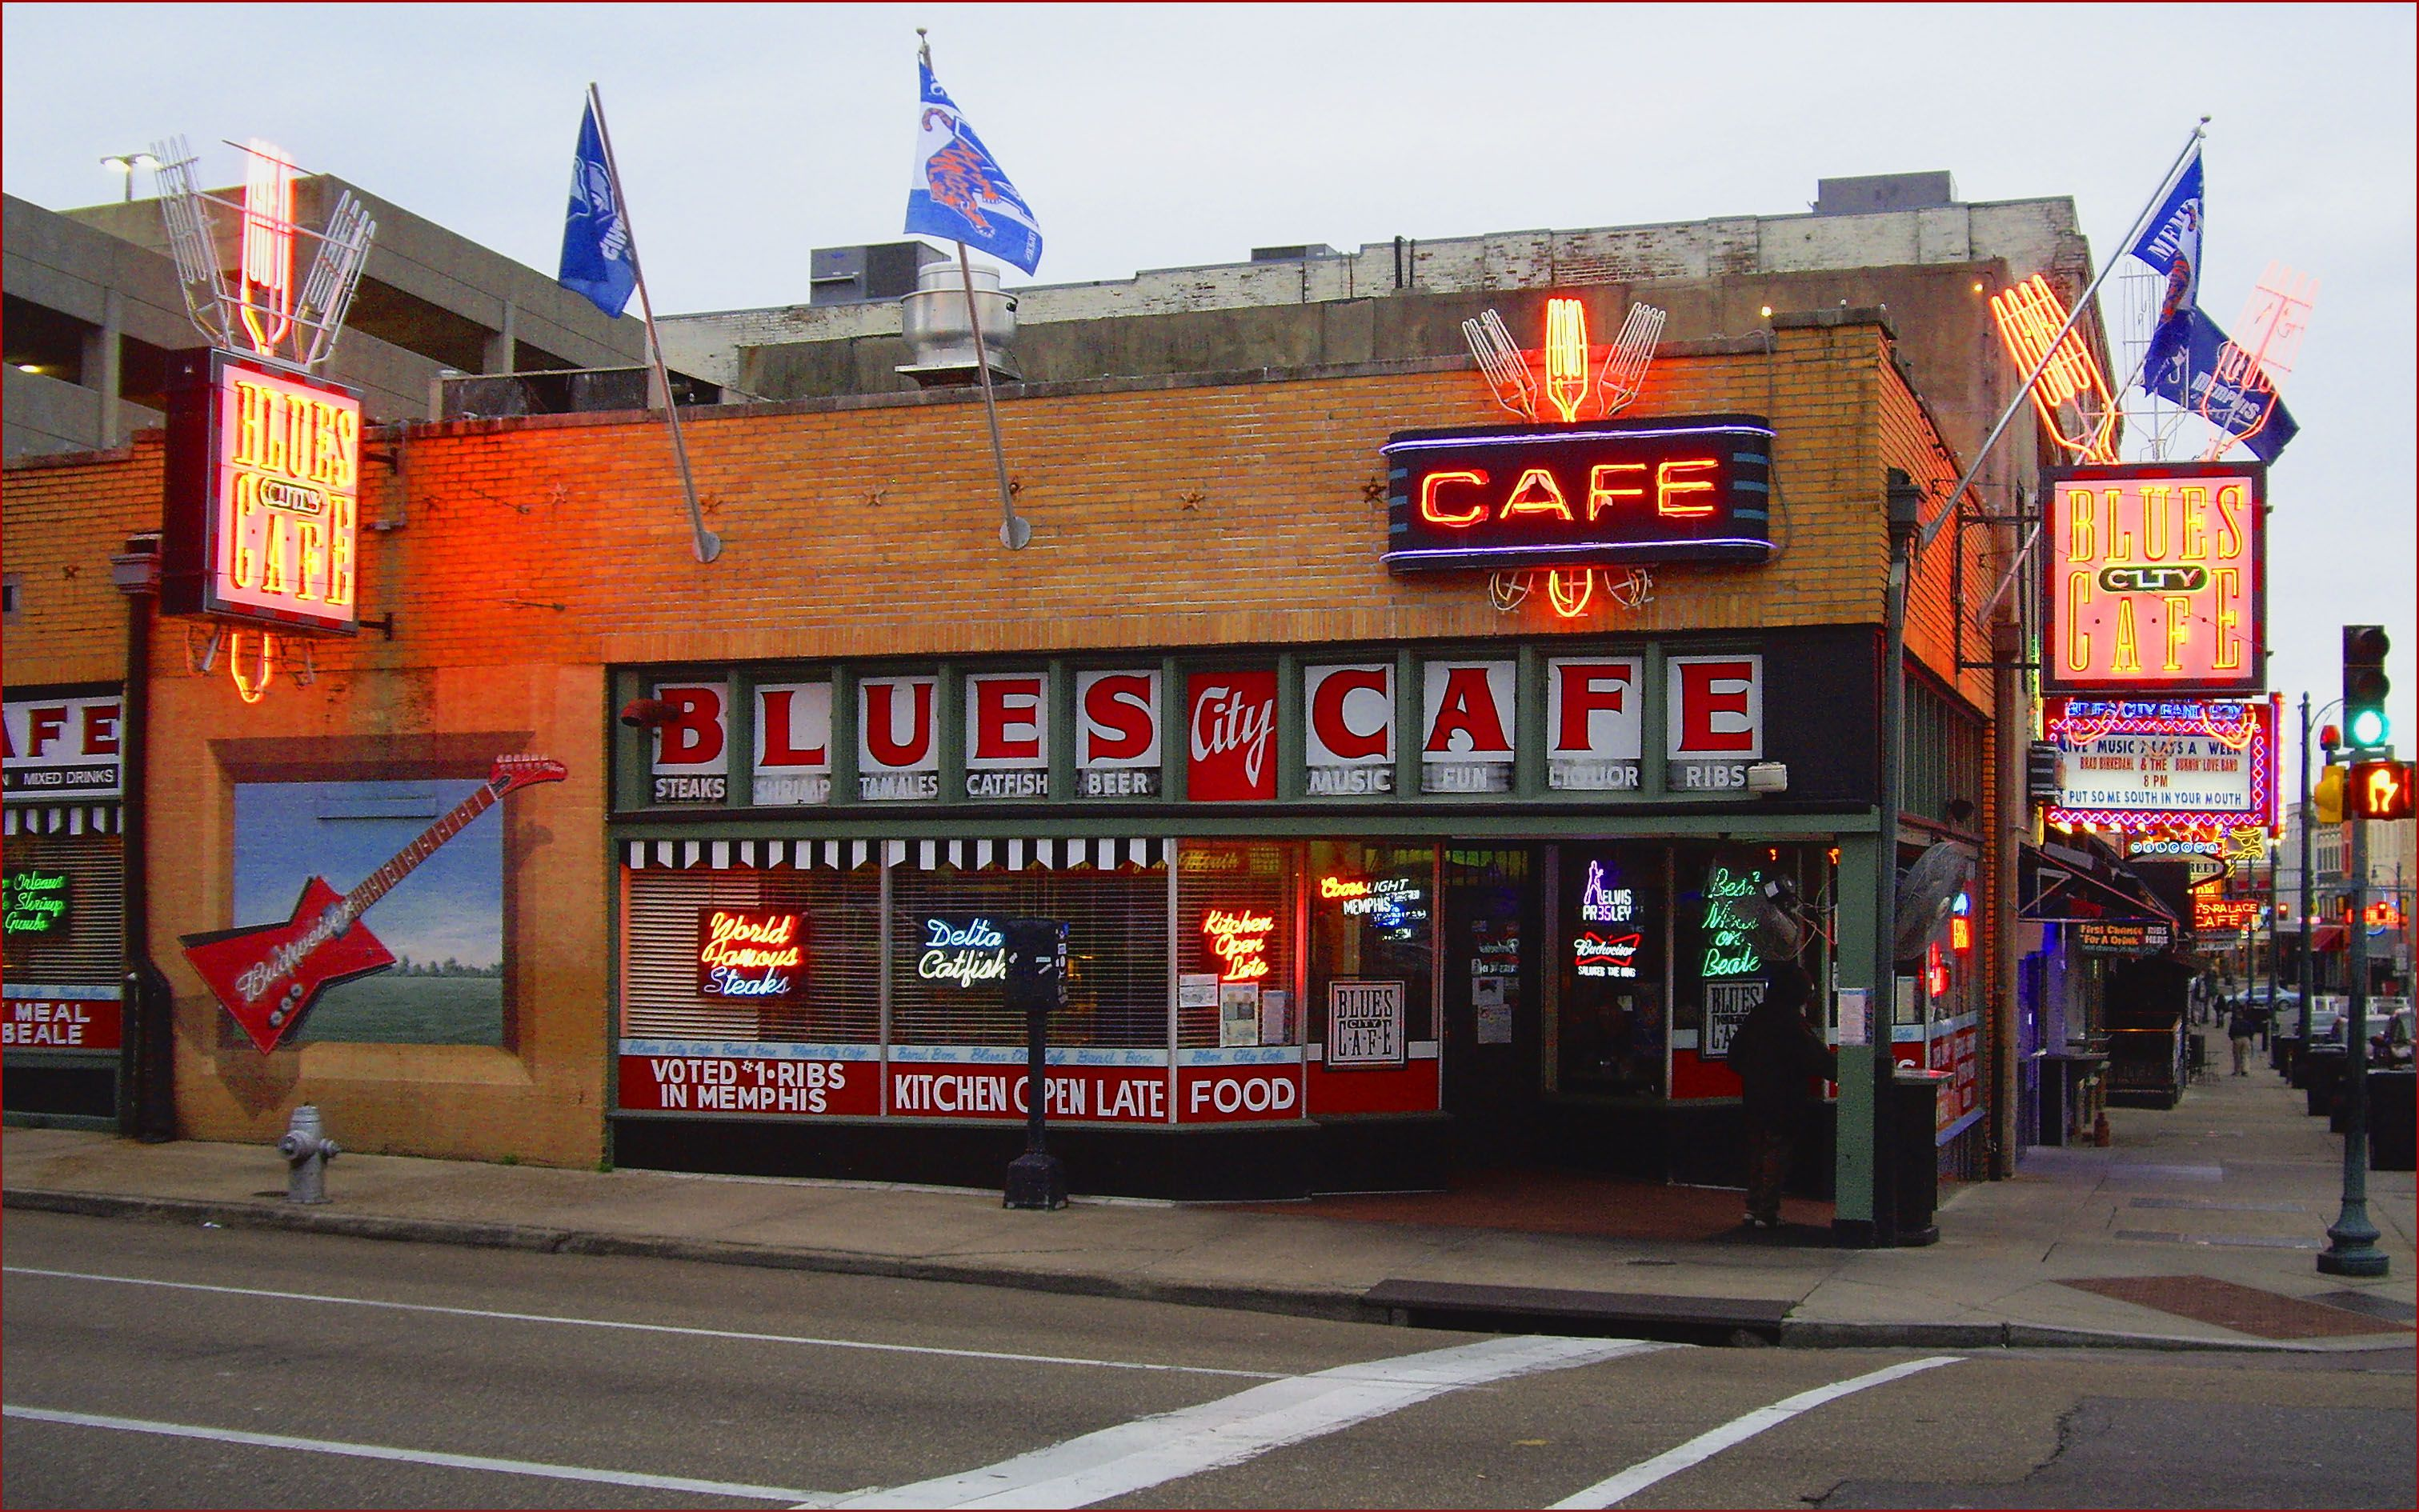 Blues City Cafe Beale Street Memphis (TN) February 2013